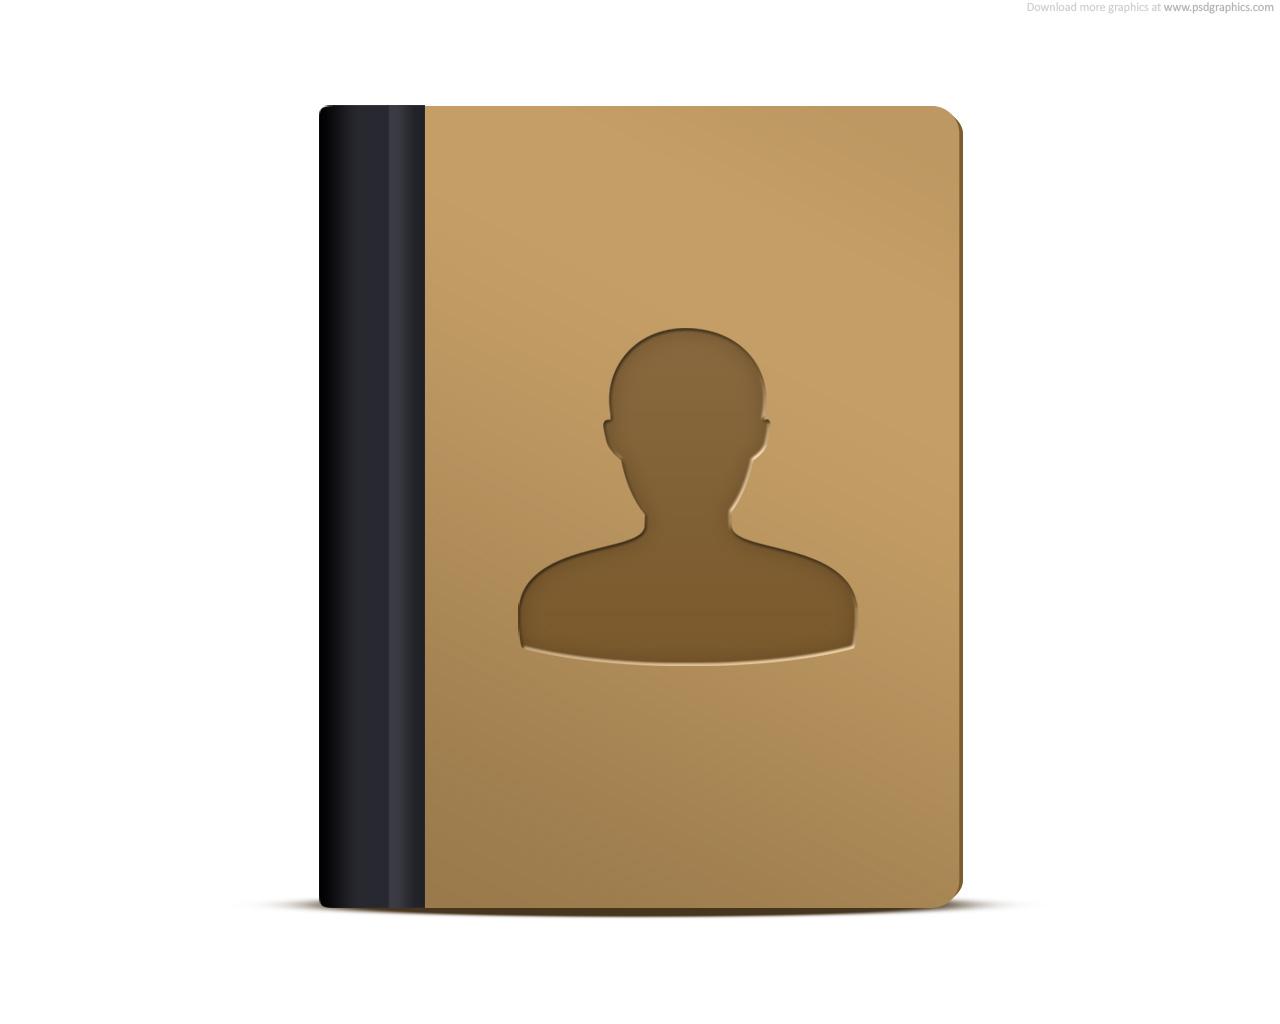 address book icon psdgraphics